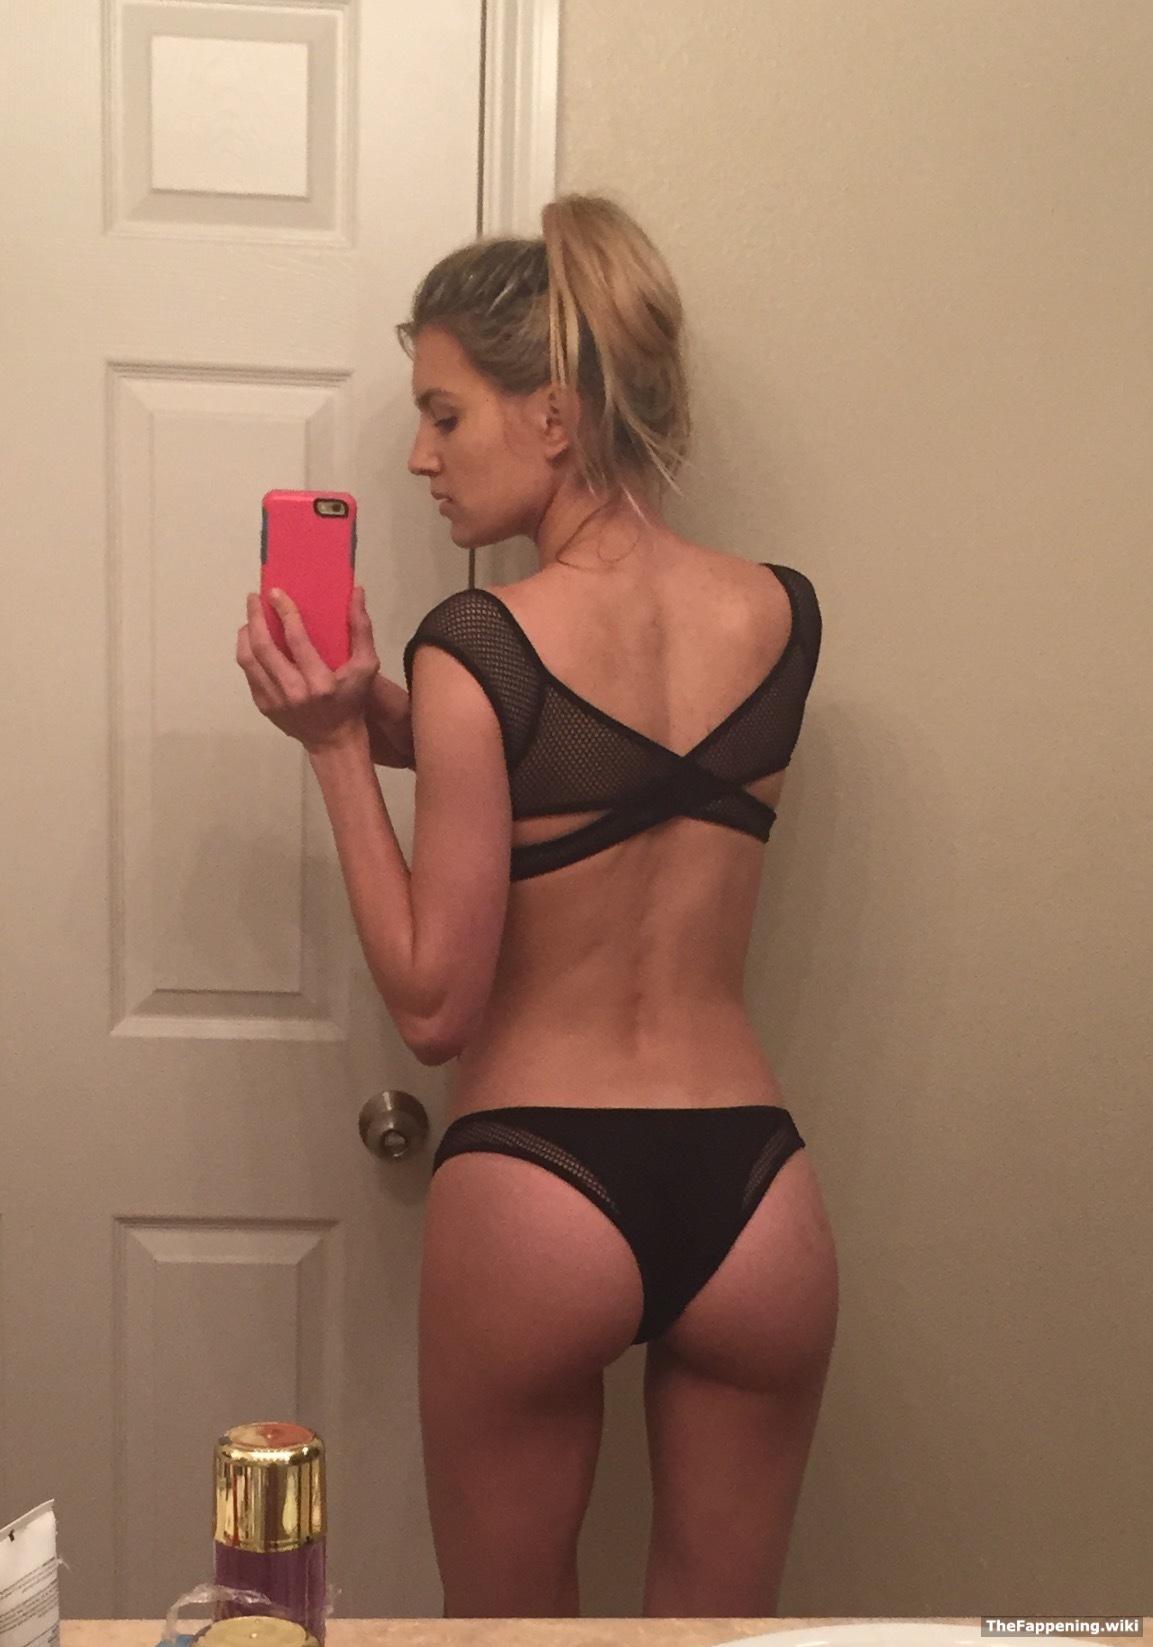 Video Krystal Gable nude (95 foto and video), Pussy, Leaked, Instagram, cameltoe 2019